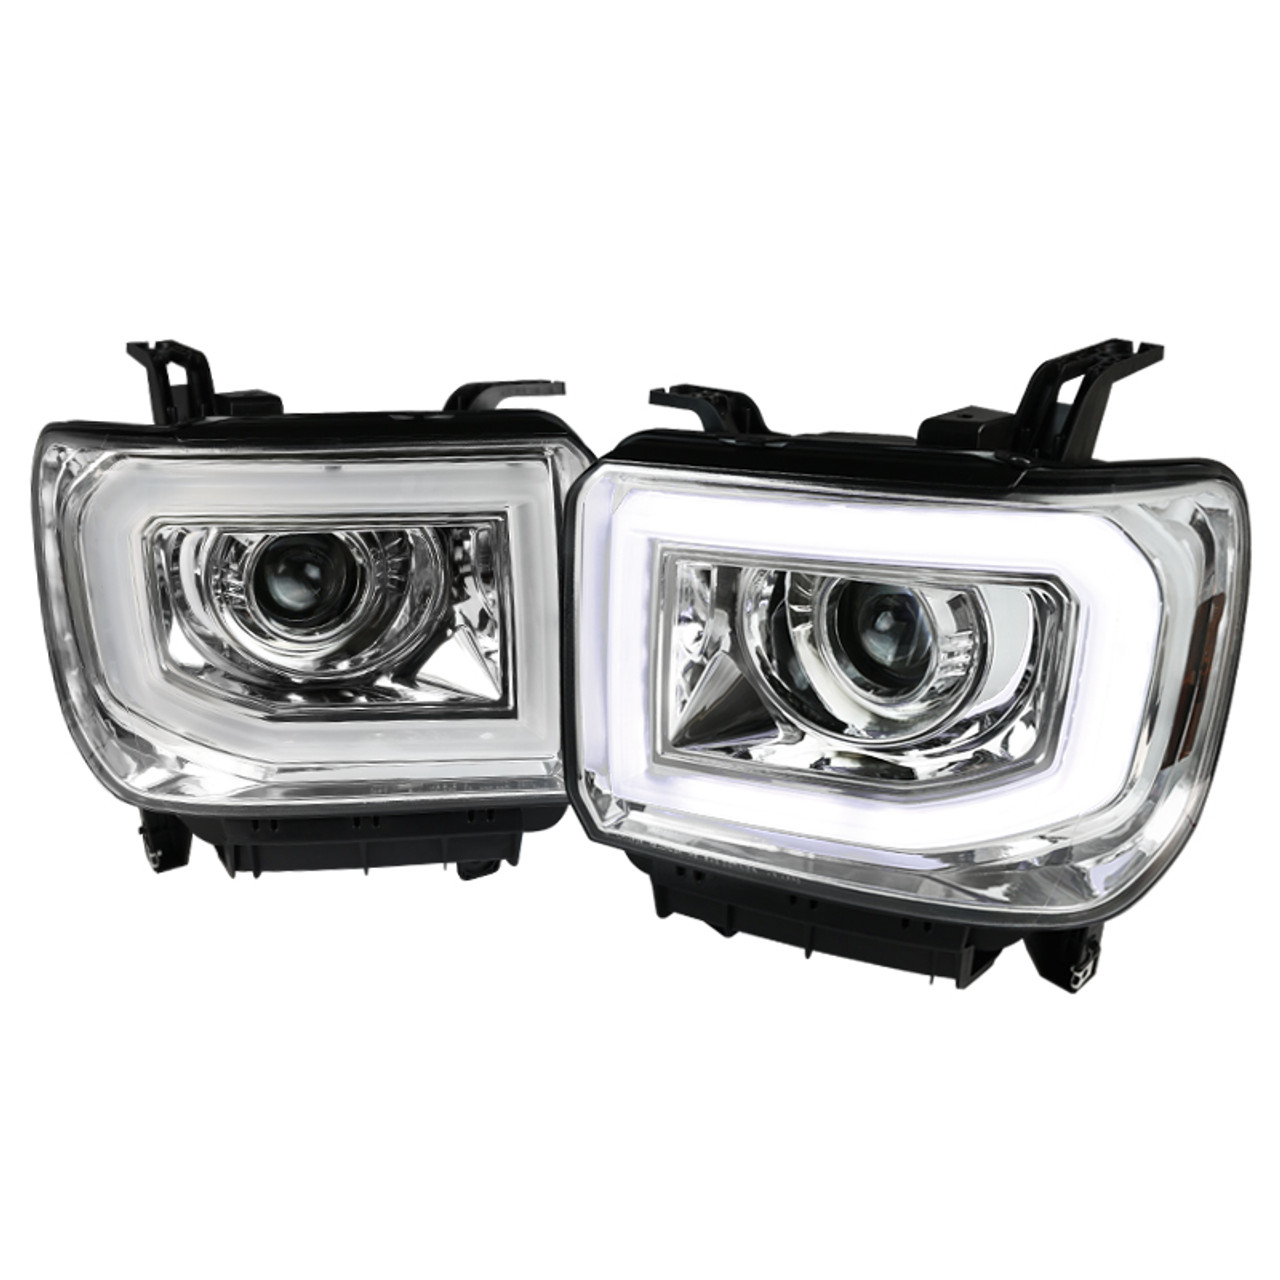 2014 2019 Gmc Sierra 1500 2500hd 3500hd Led Drl Projector Headlight W Led Turn Signal Matte Black Housing Clear Lens K2 Motor